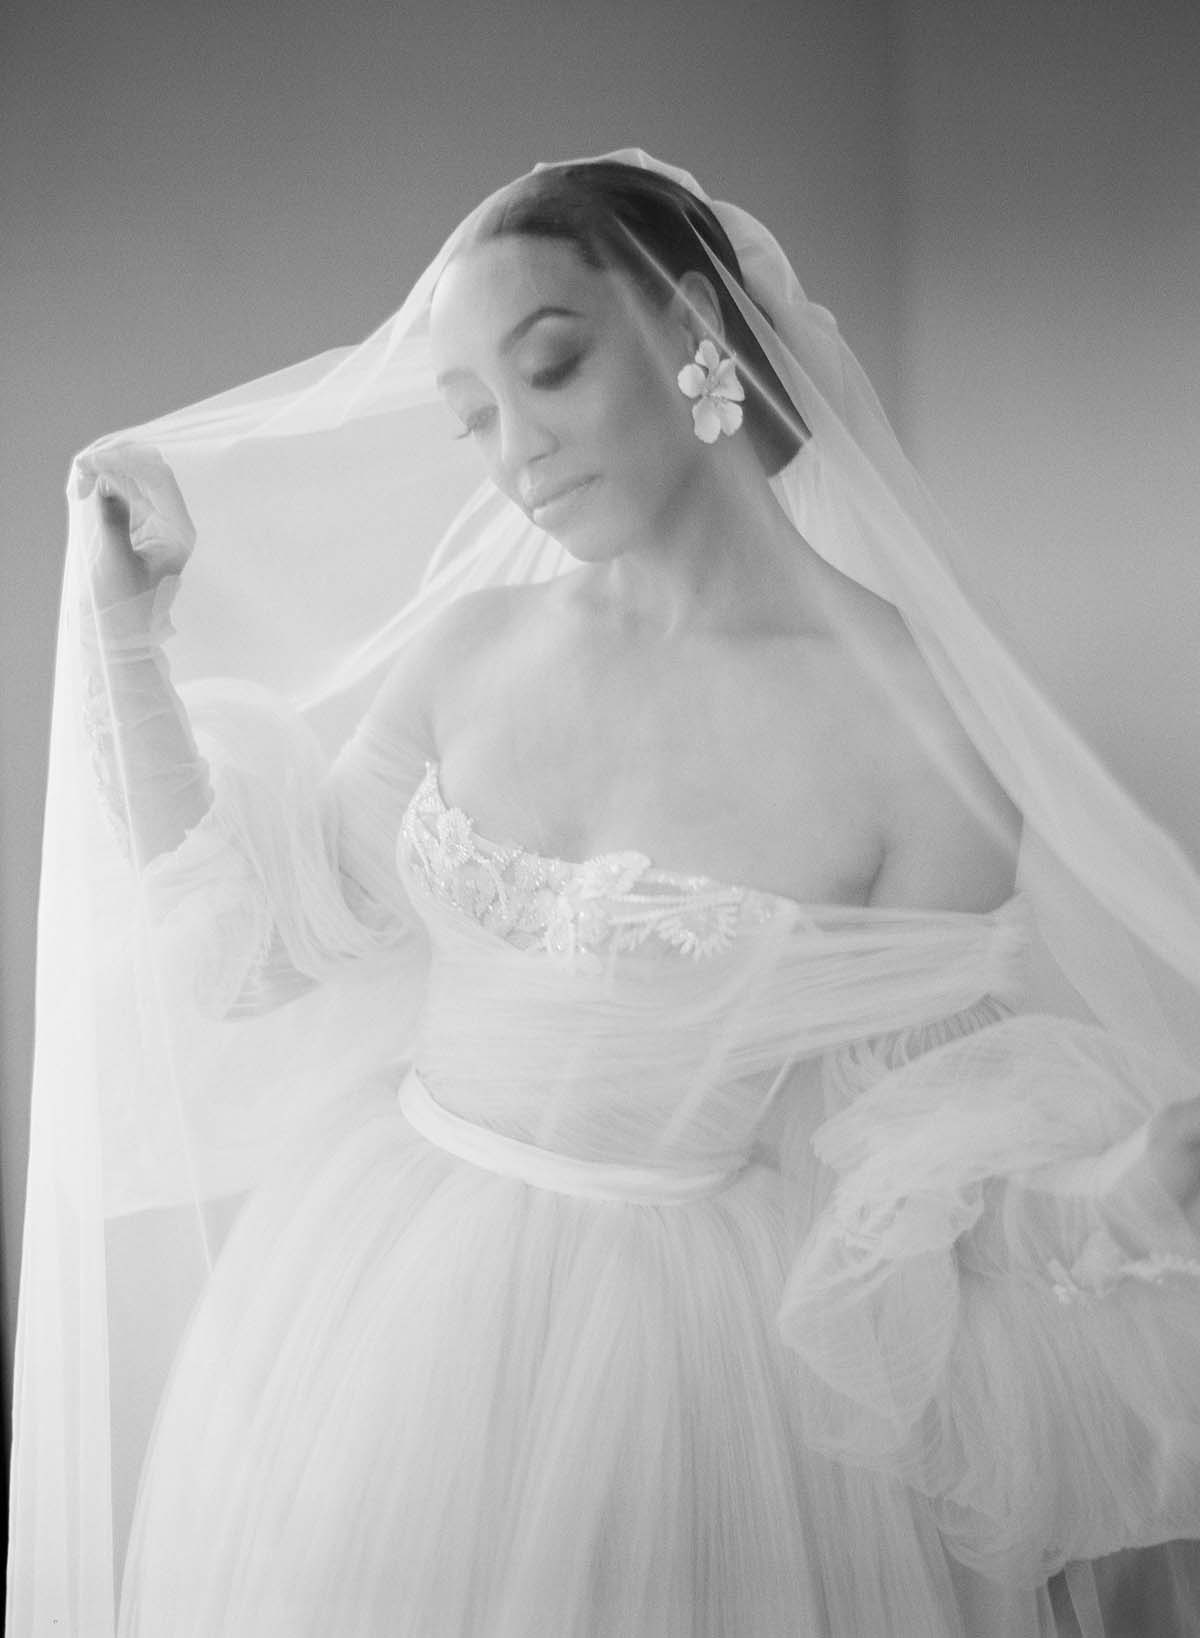 XOXO_BRIDE_Events-Michelle-Beller_Photography_0151